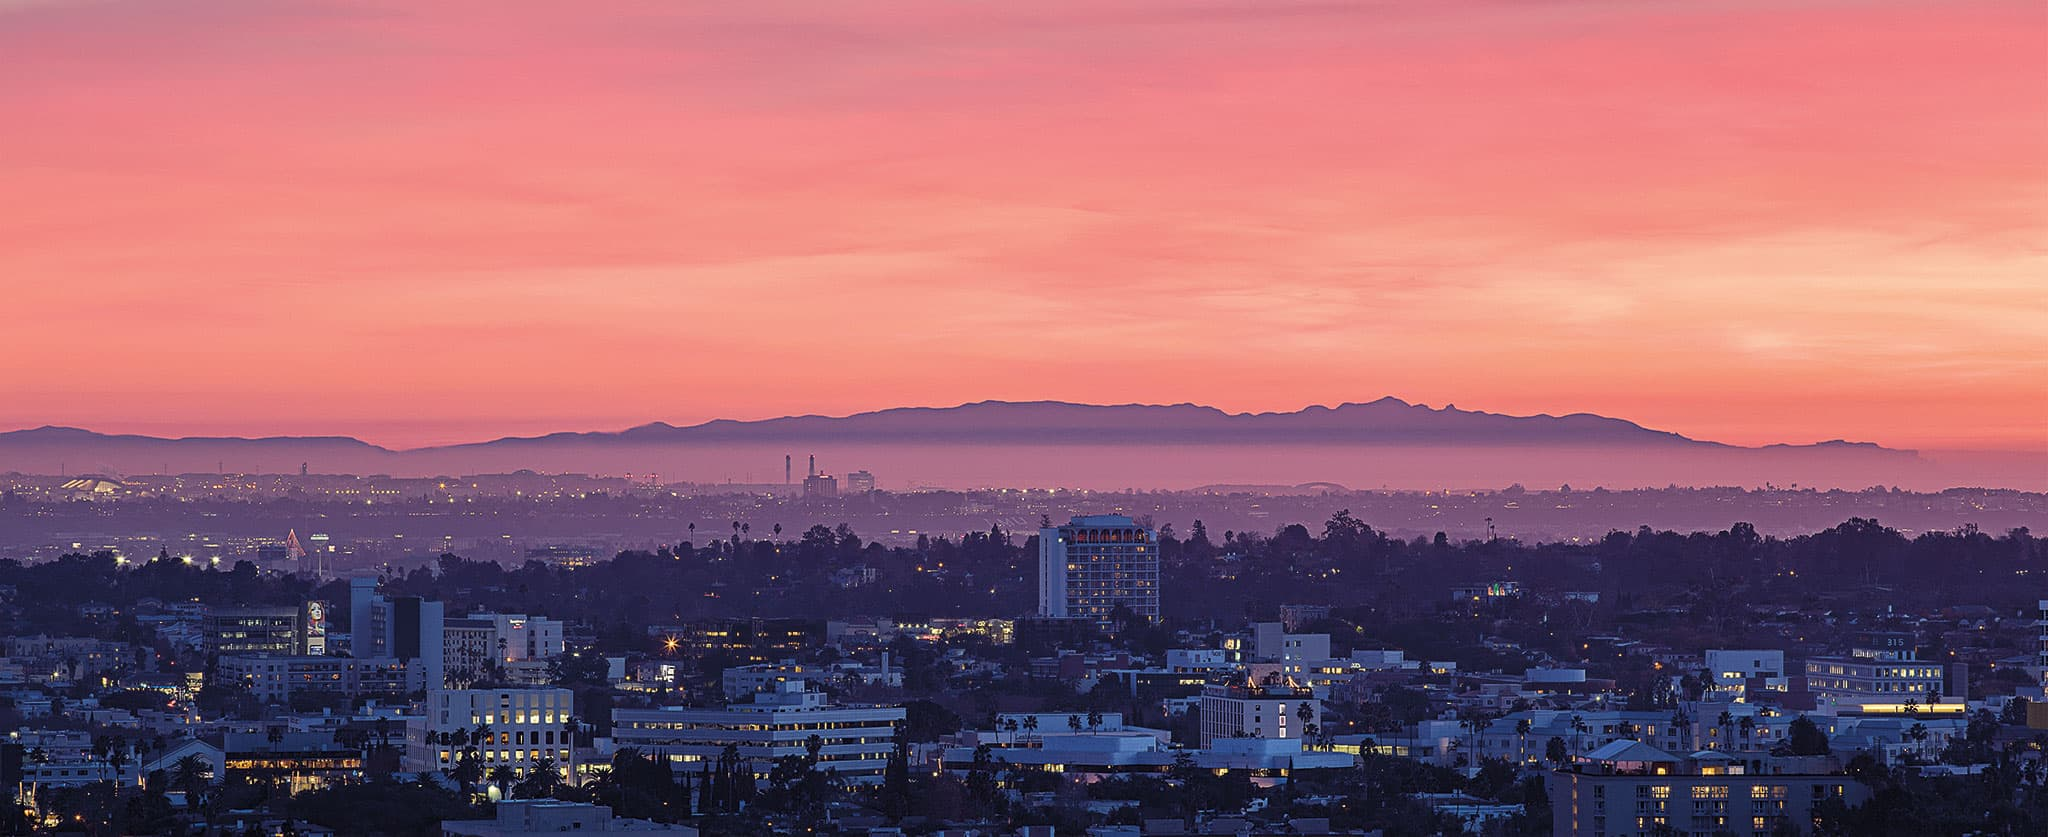 South-facing view at sunset